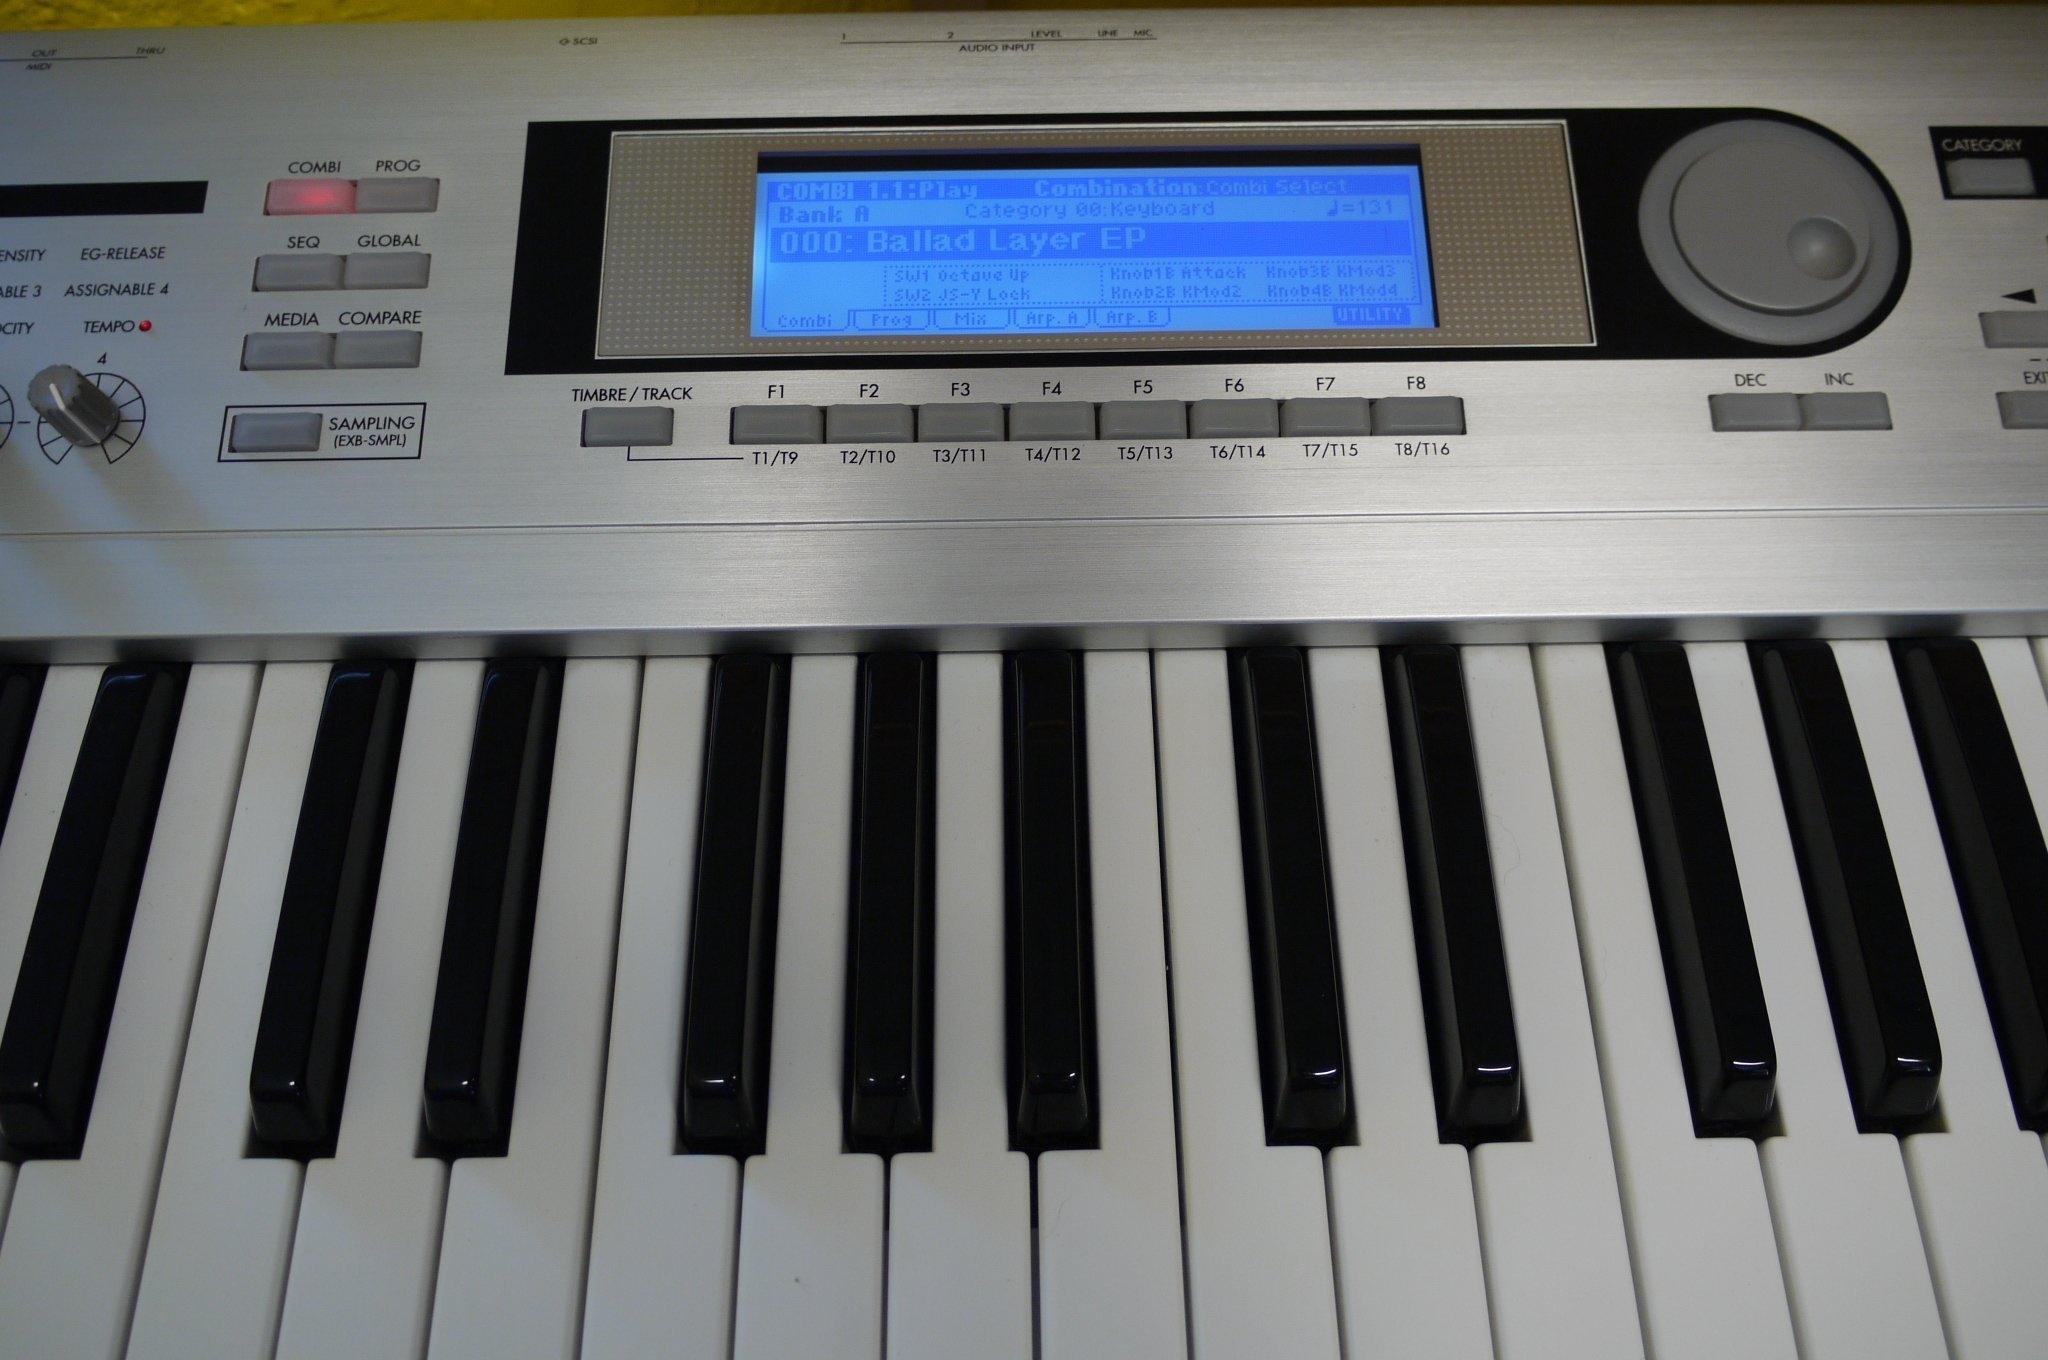 korg triton le 76 image 361862 audiofanzine rh en audiofanzine com korg triton extreme music workstation sampler manual korg triton le keyboard manual